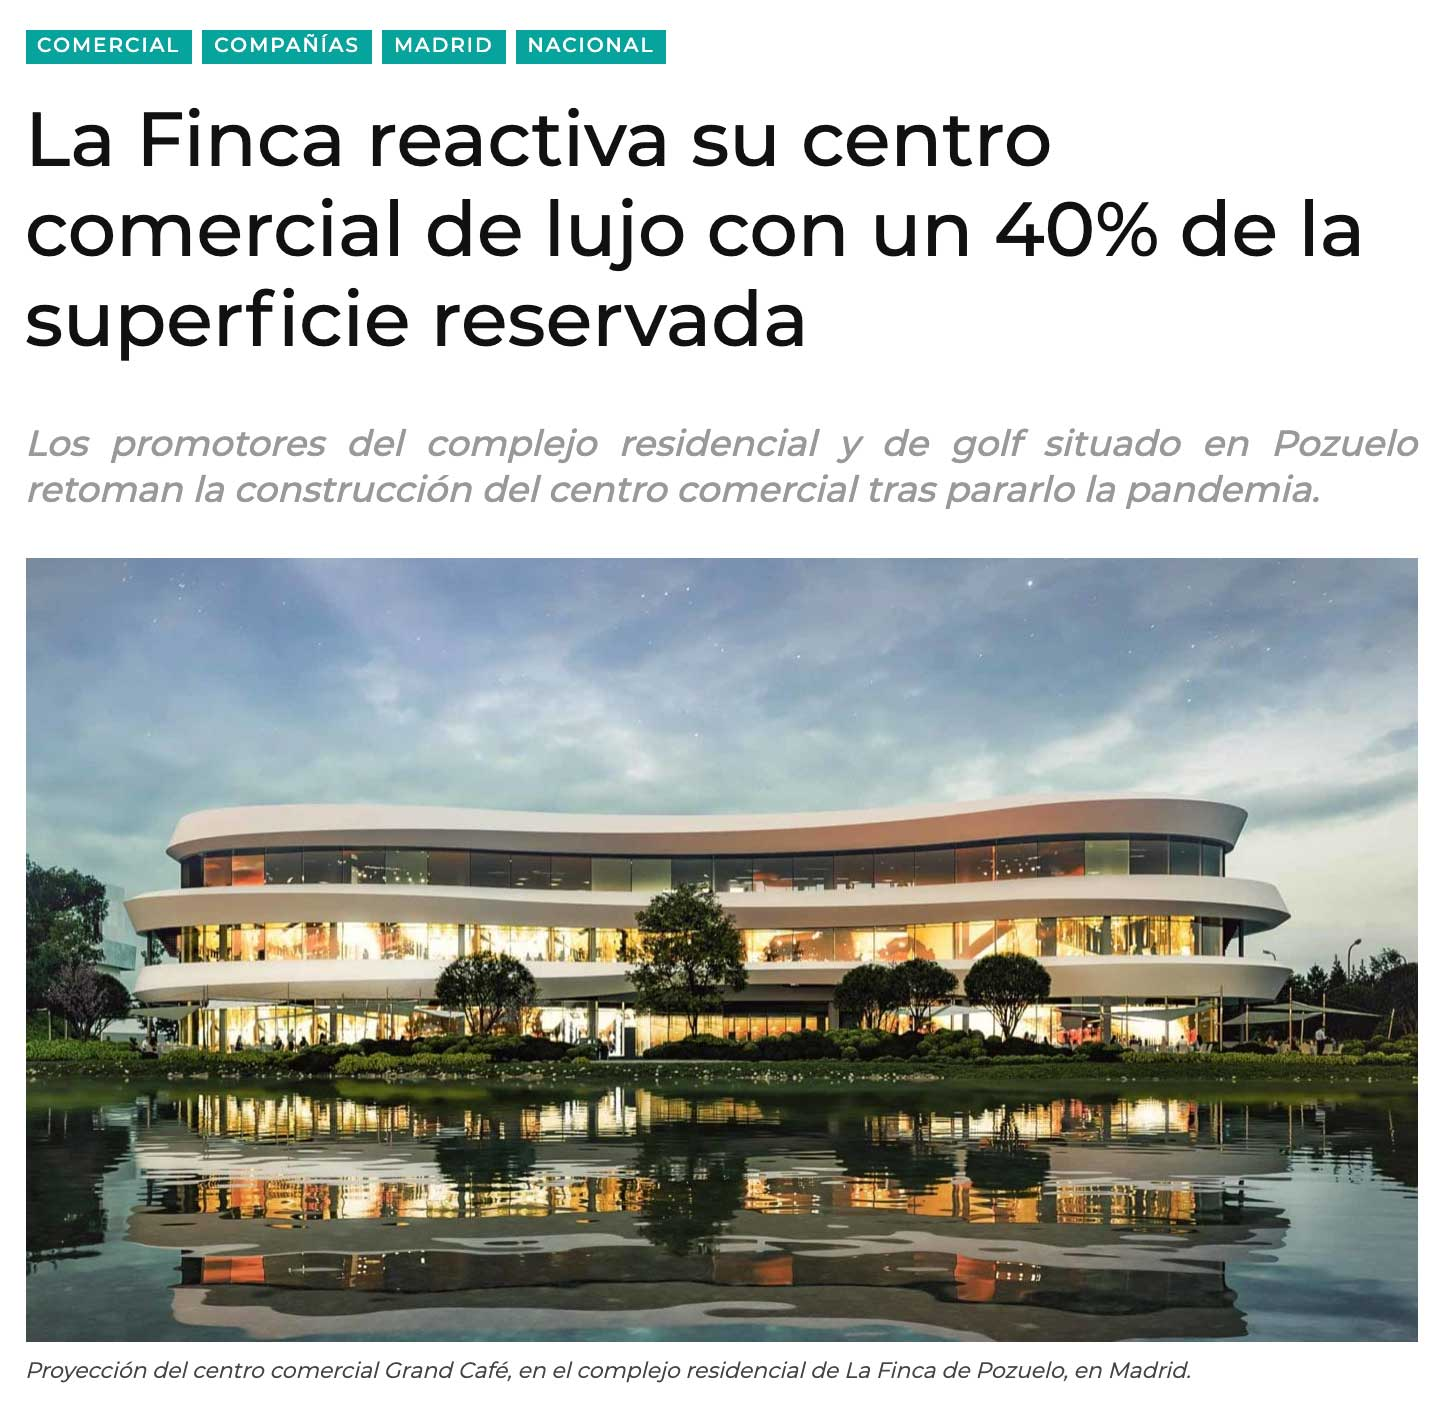 LaFinca reactiva su centro comercial Grand Café con un 40 % de superficie reservada